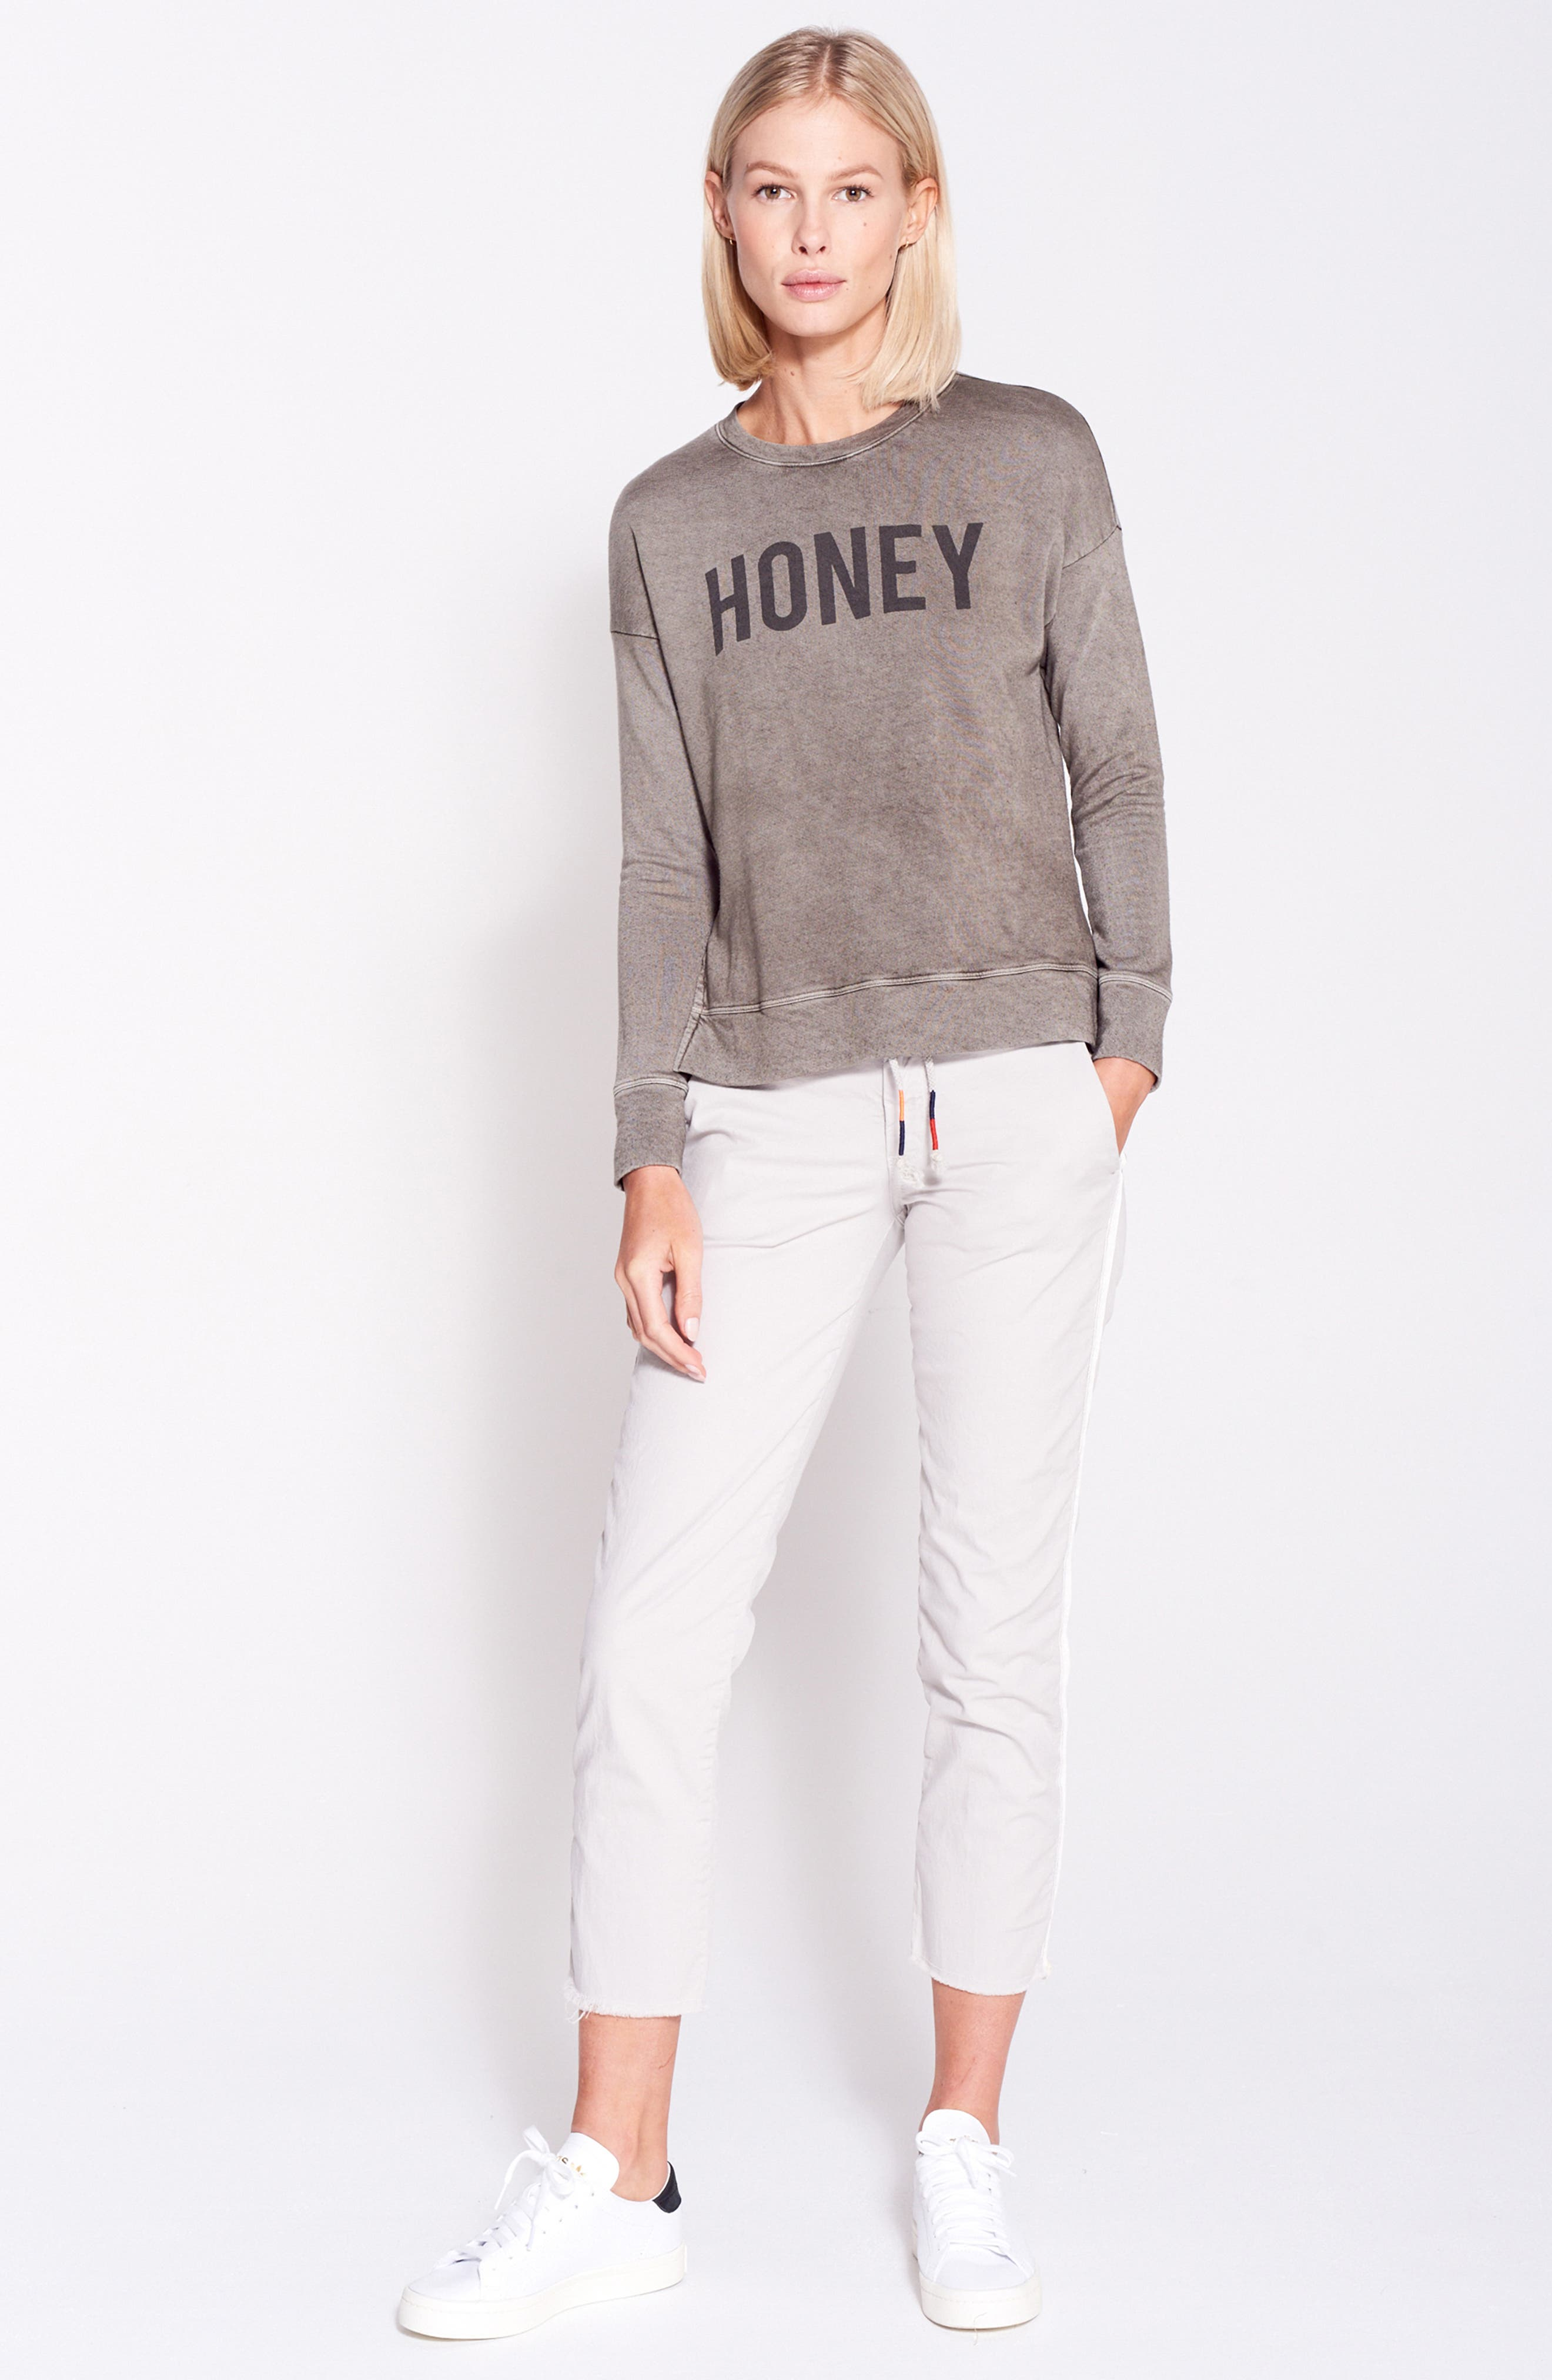 Honey Faded Sweatshirt,                             Alternate thumbnail 7, color,                             300